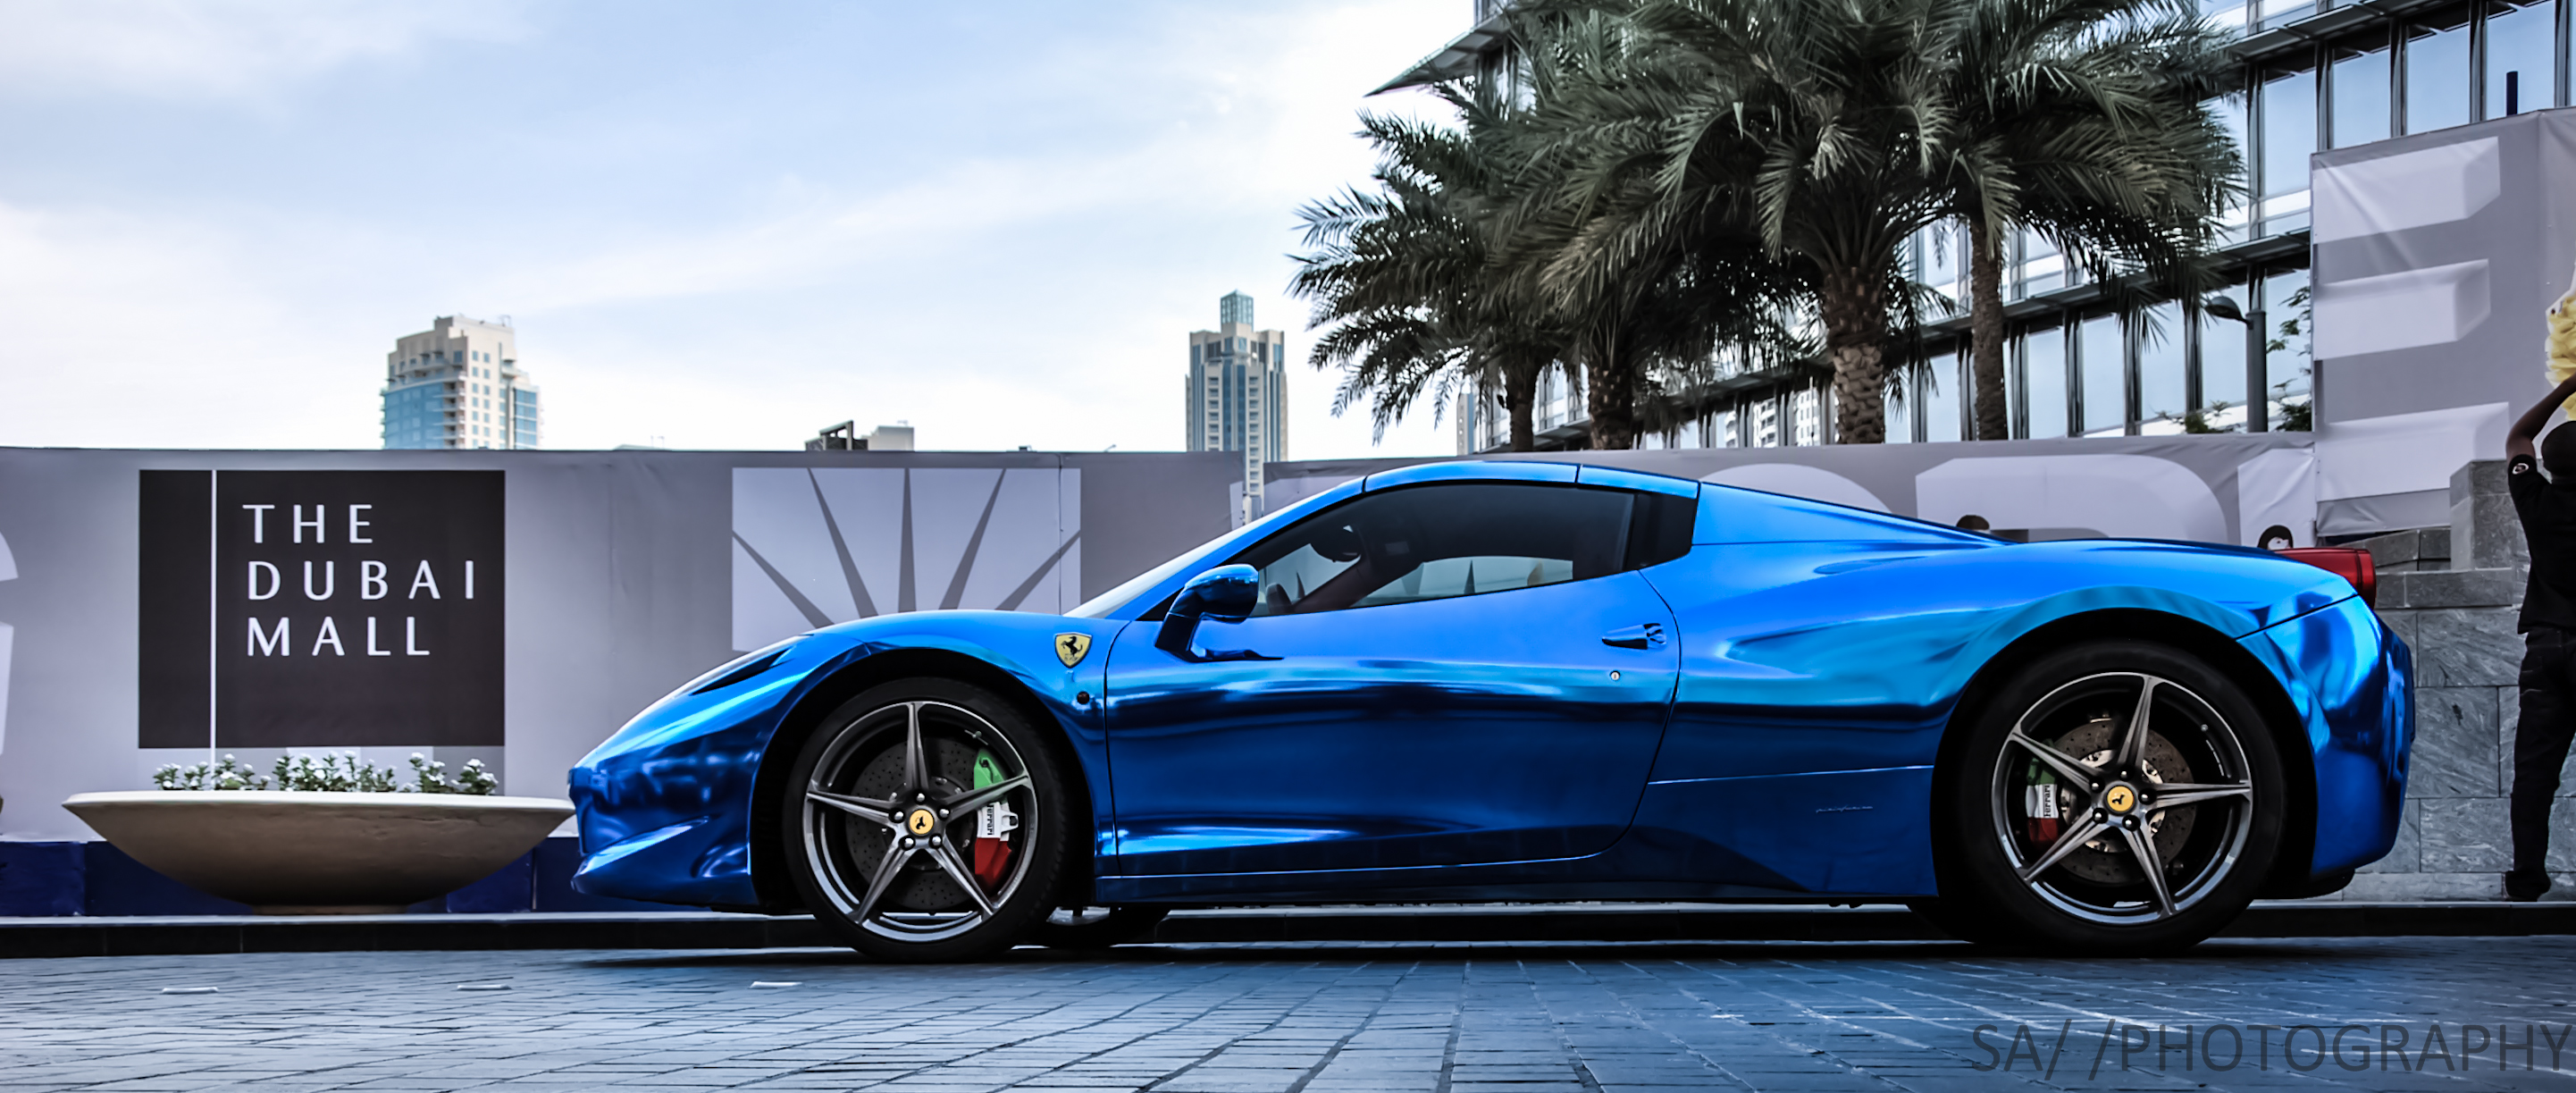 ferrari 458 italia in blue chrome os 2883 x 1223 - Ferrari 458 Italia Blue